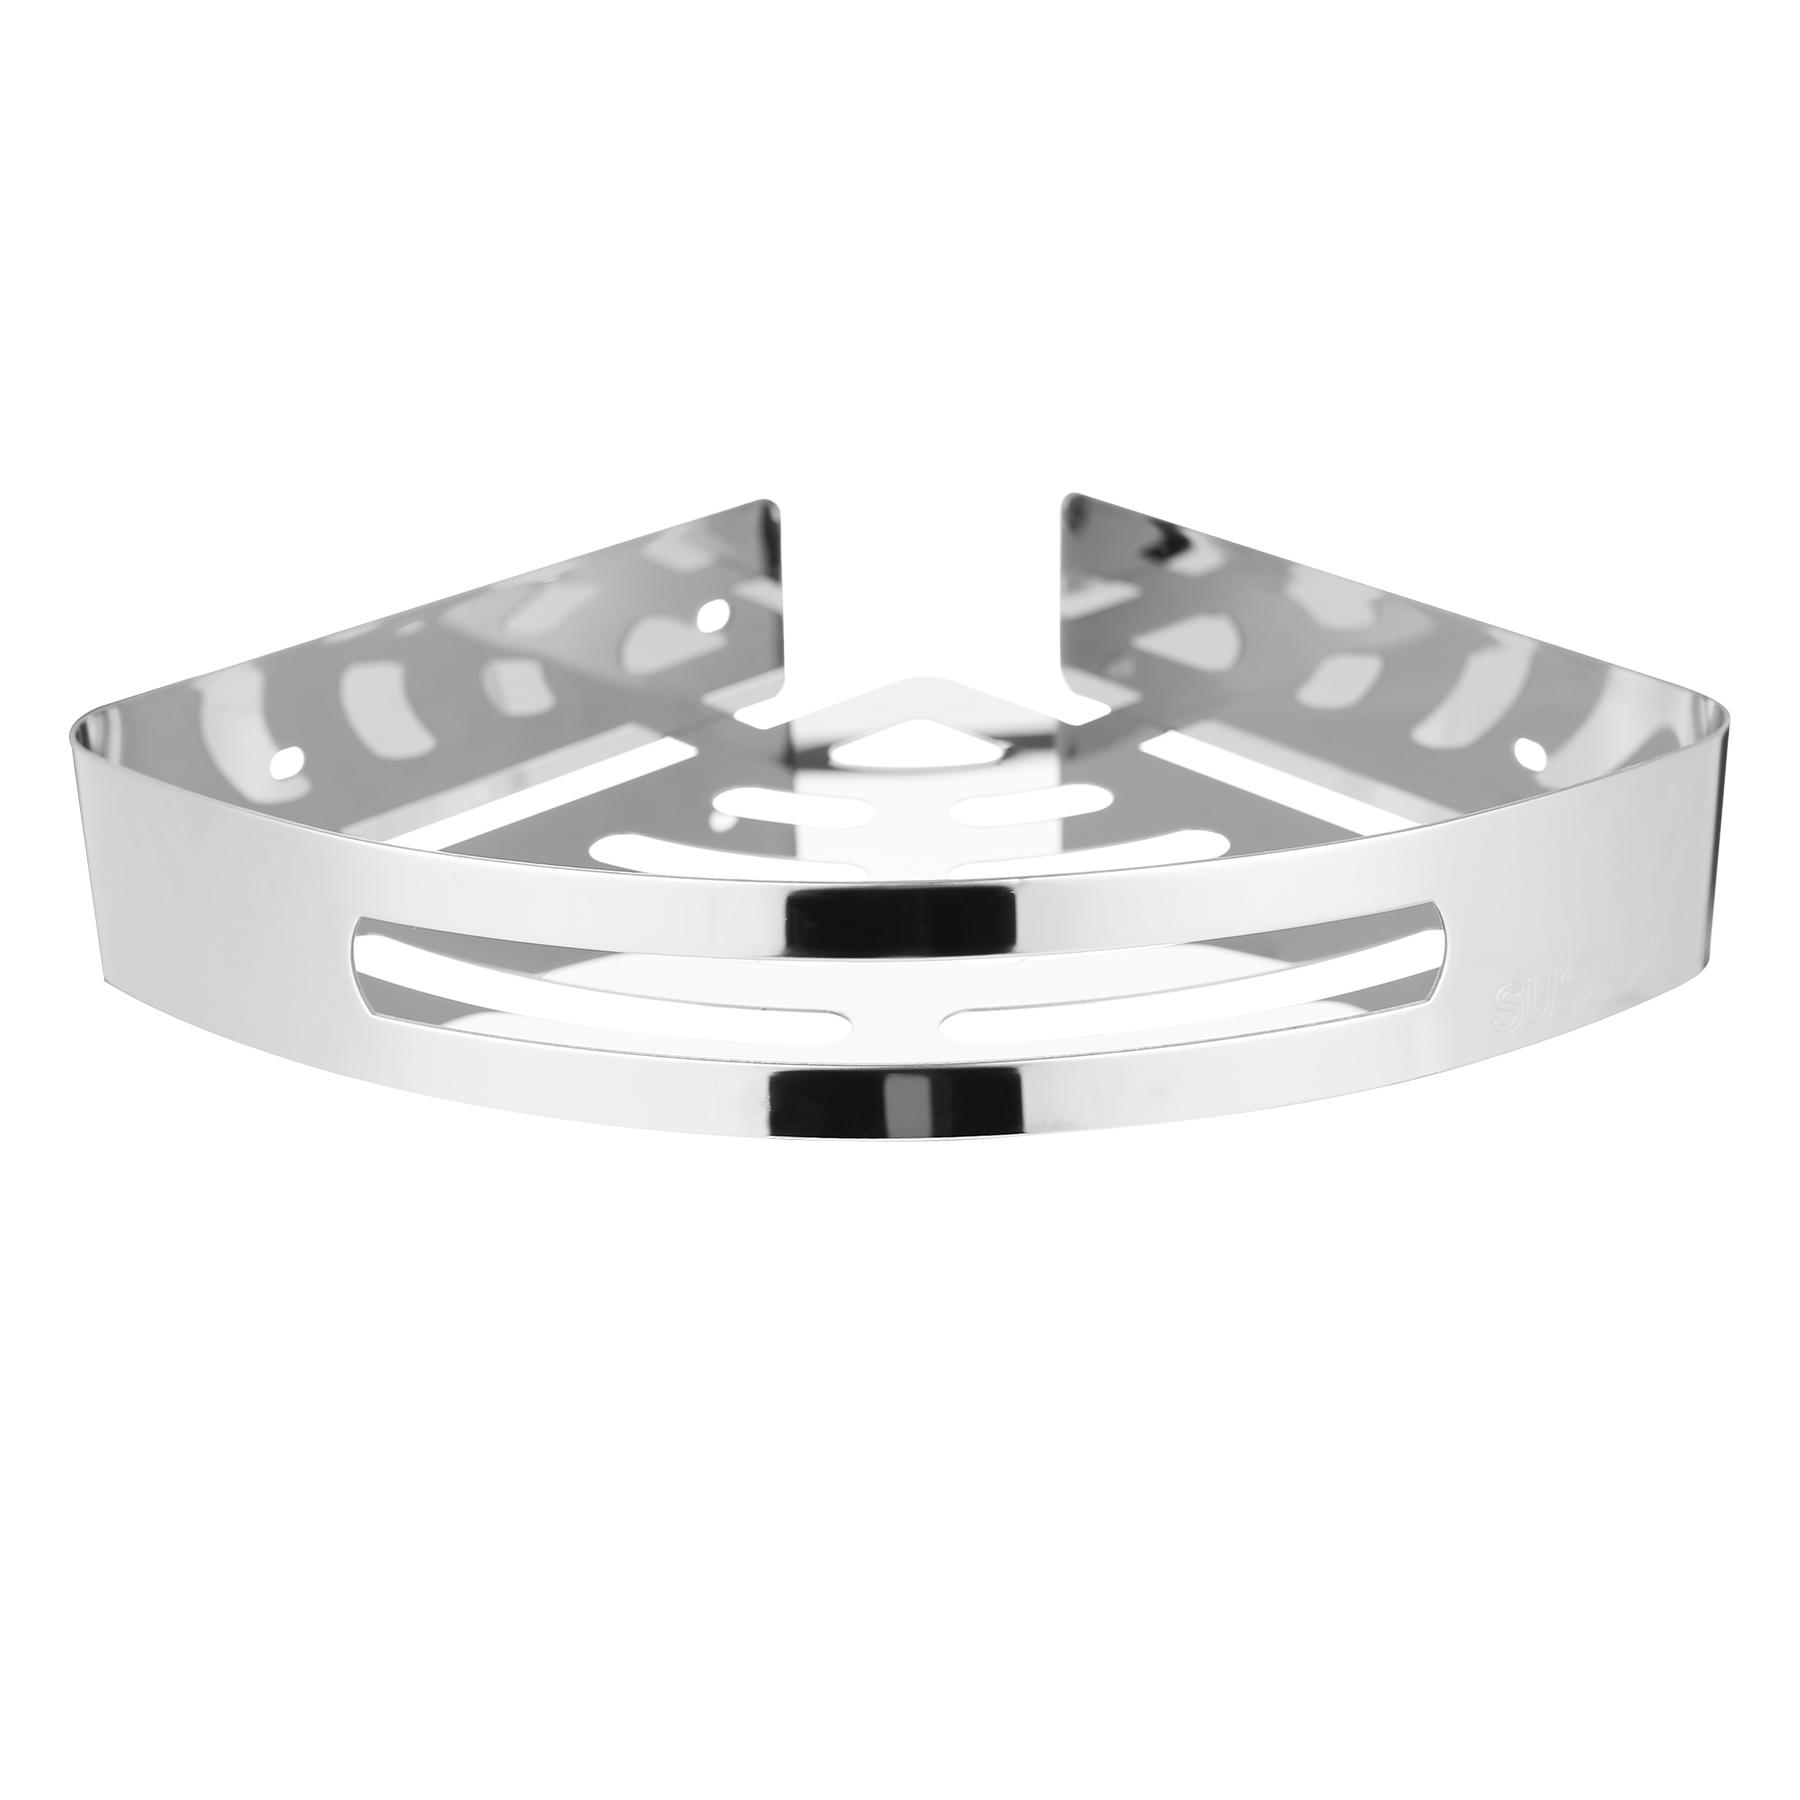 US$ 18.99 - Gloriest Corner Shower Basket, Stainless Steel Corner ...